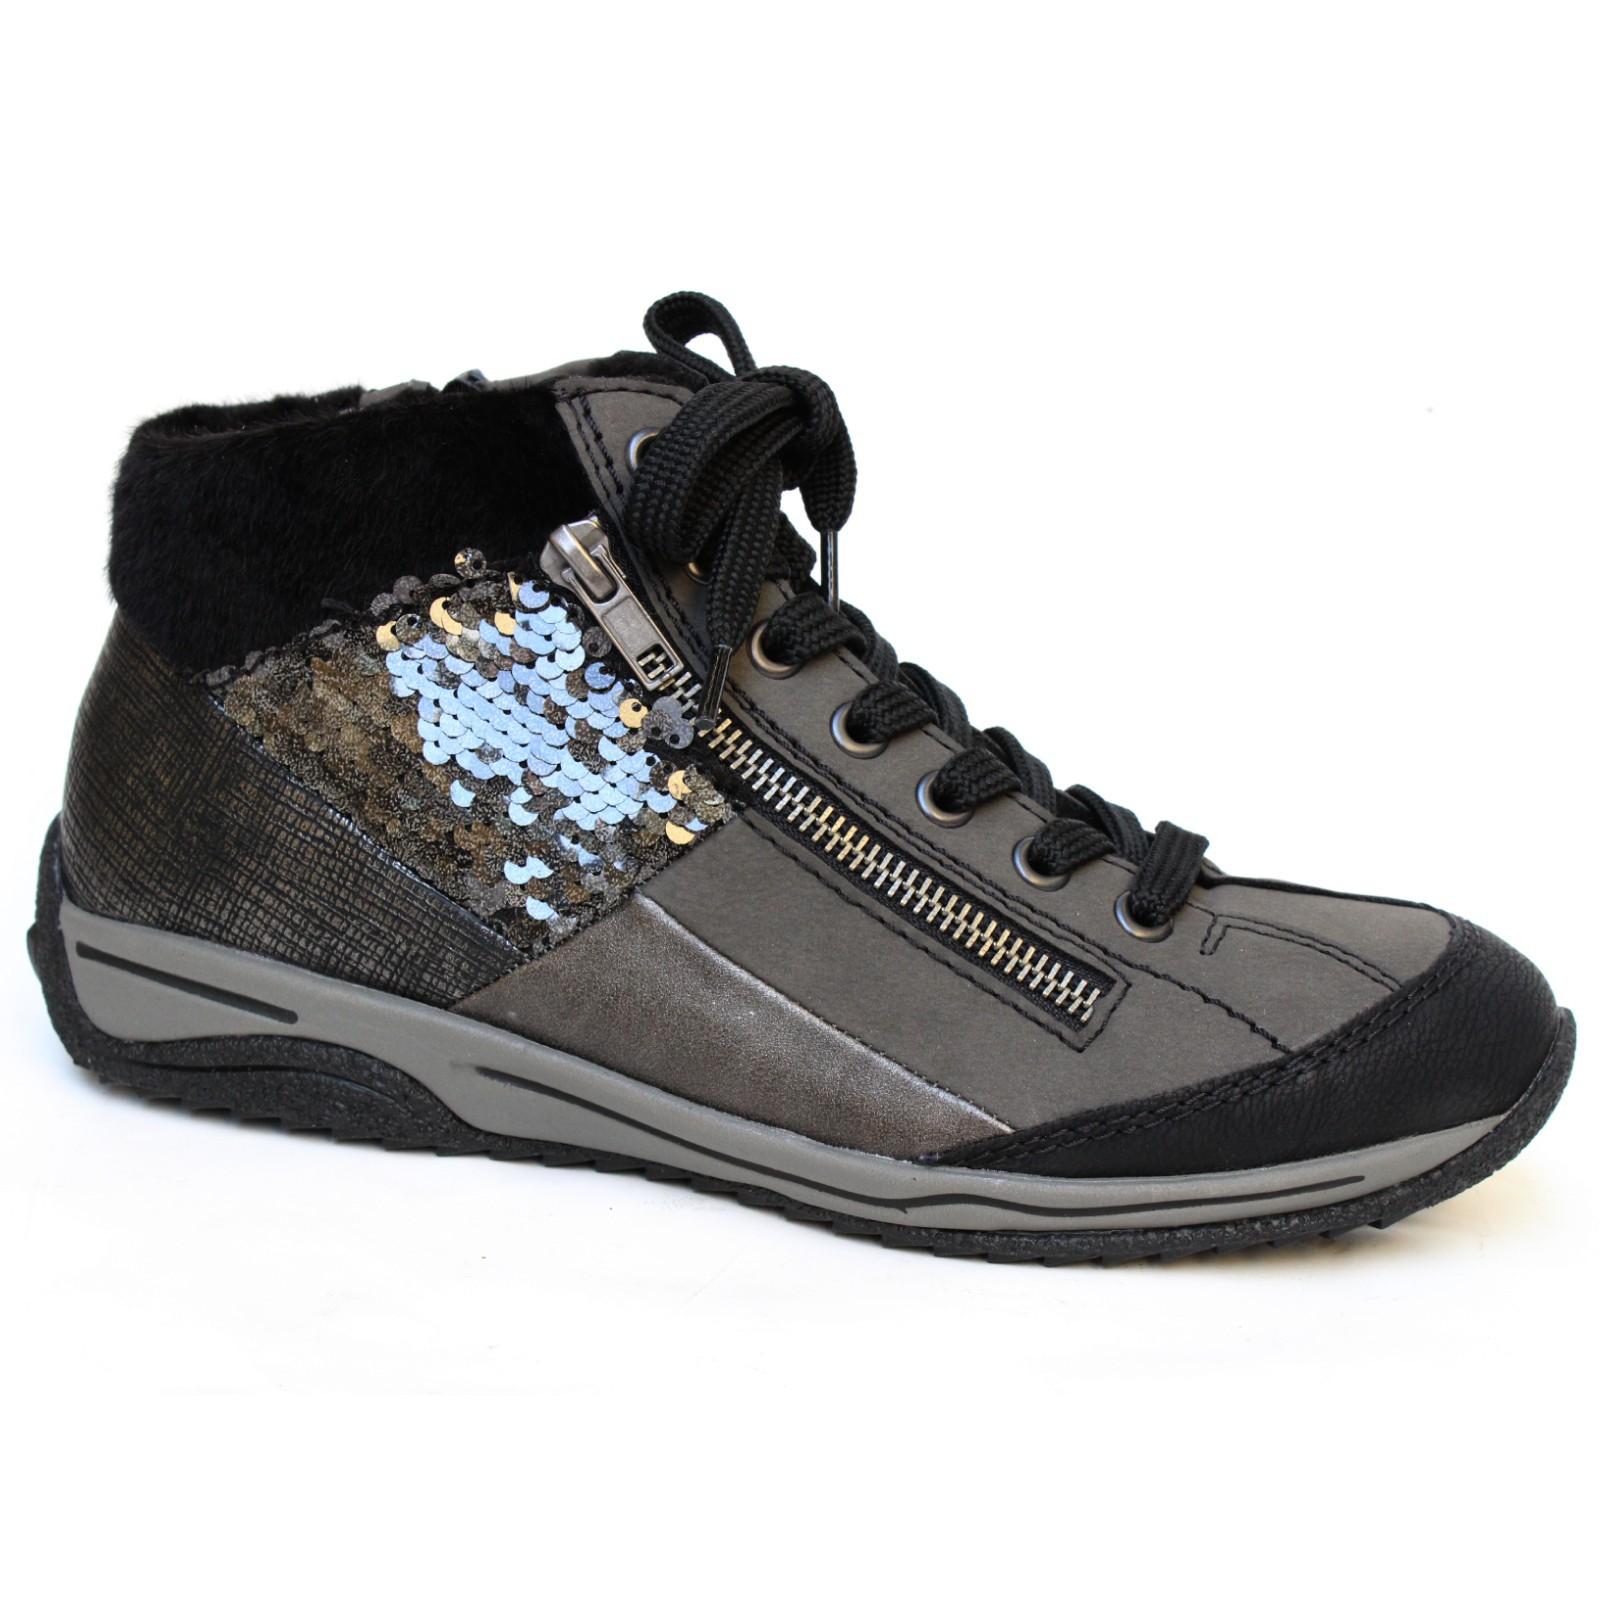 04242 Rieker női fűzős-cipzáras bokacipő L5234-01 Mombasa - Női ... 9c015b2ecd